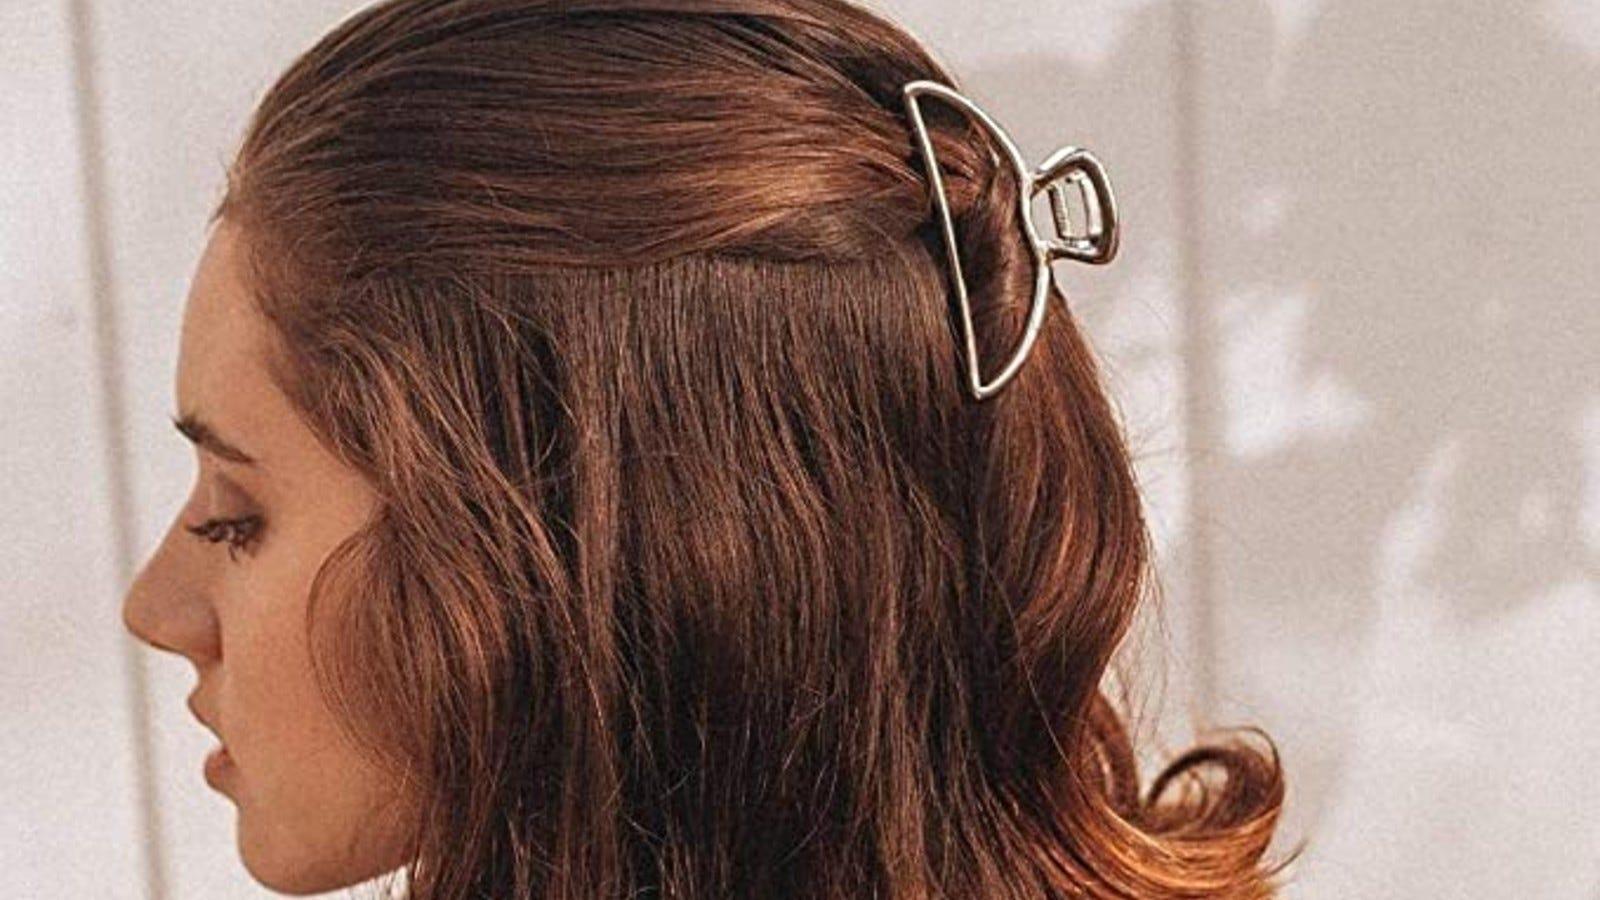 A woman wearing a Kitsch Metal Hair Clip.